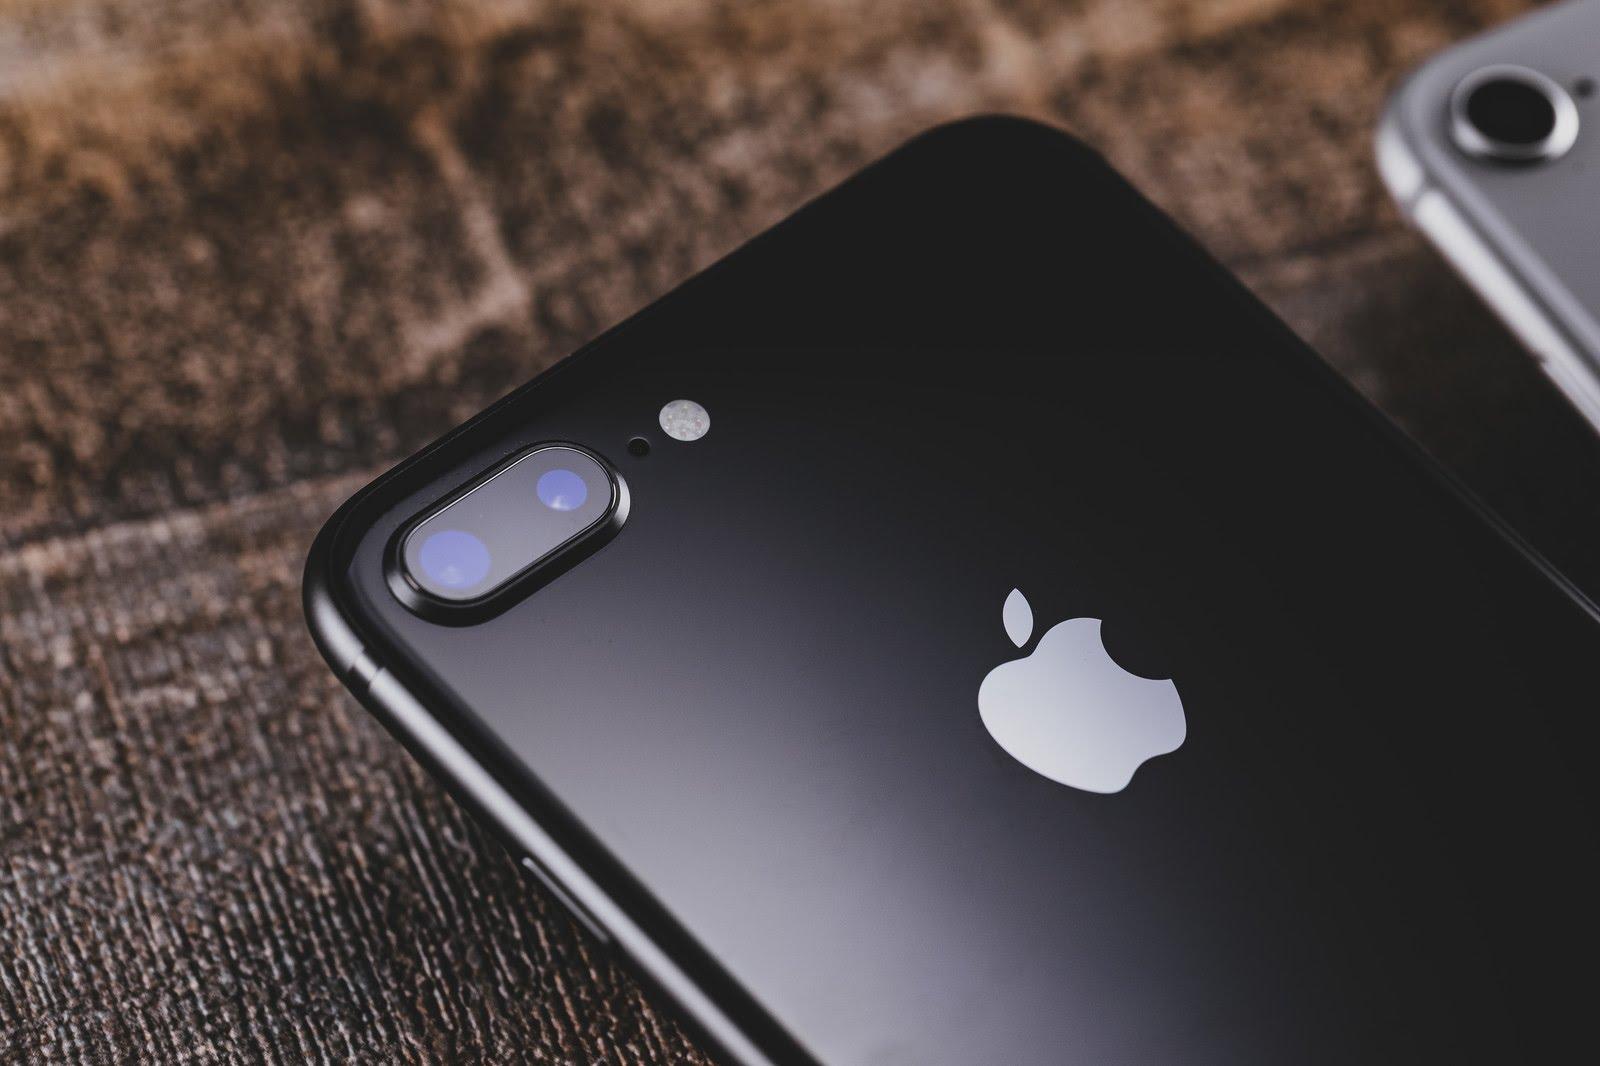 Apple(日本)の iPhone・iPad 価格一覧【2019年1月版】